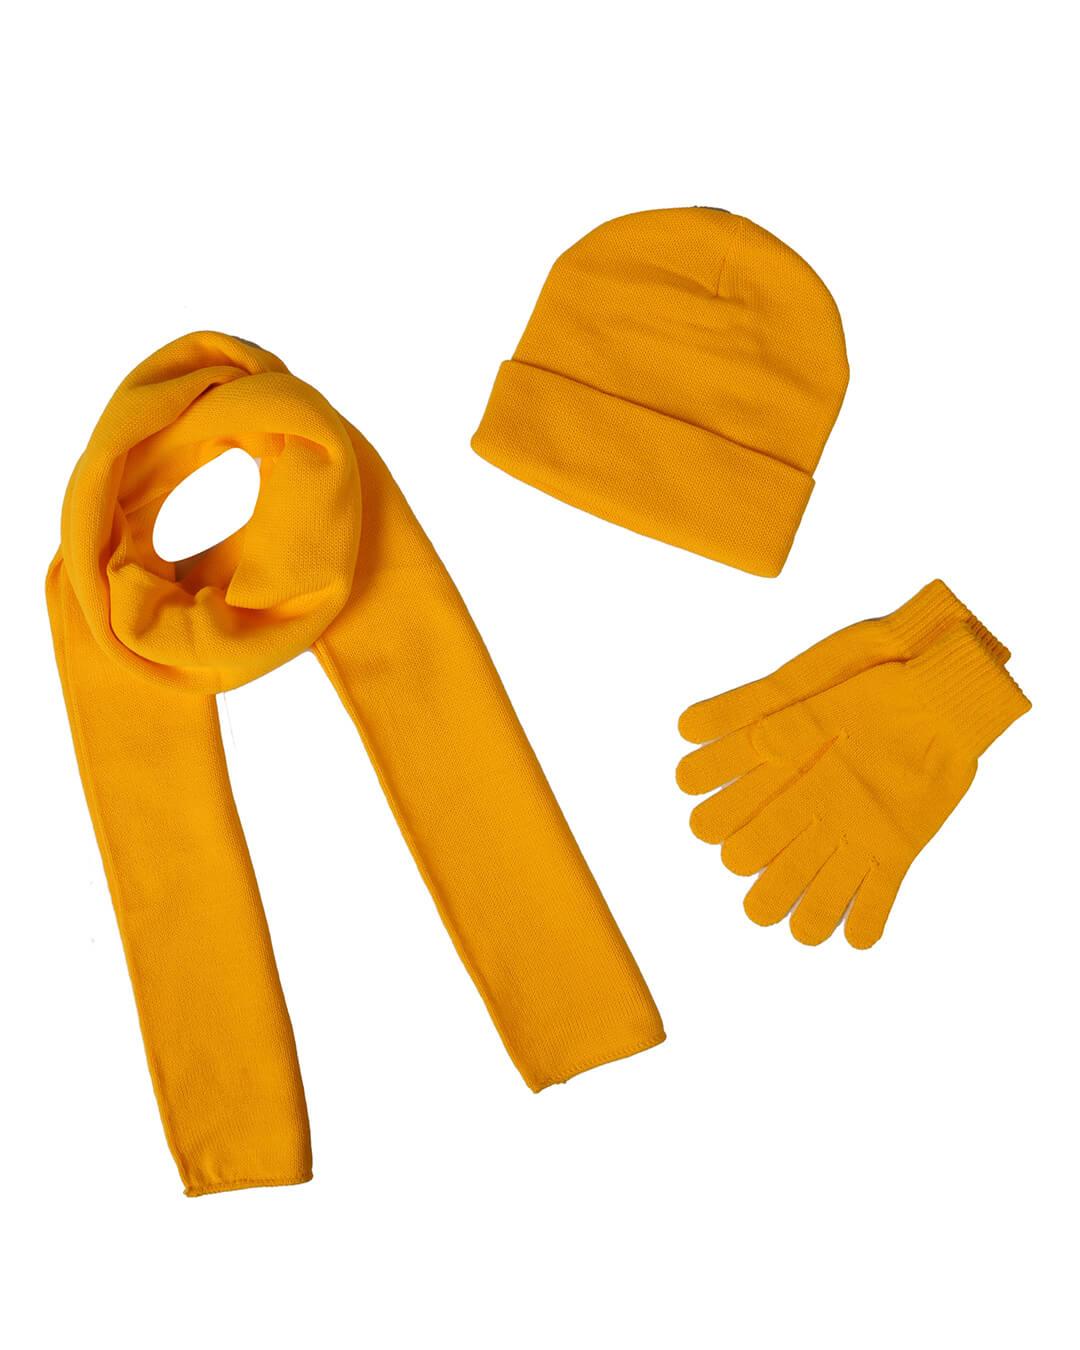 CMFW-19-03 - Atkı Bere Takımı - Ürün Resmi - CMF Şapka